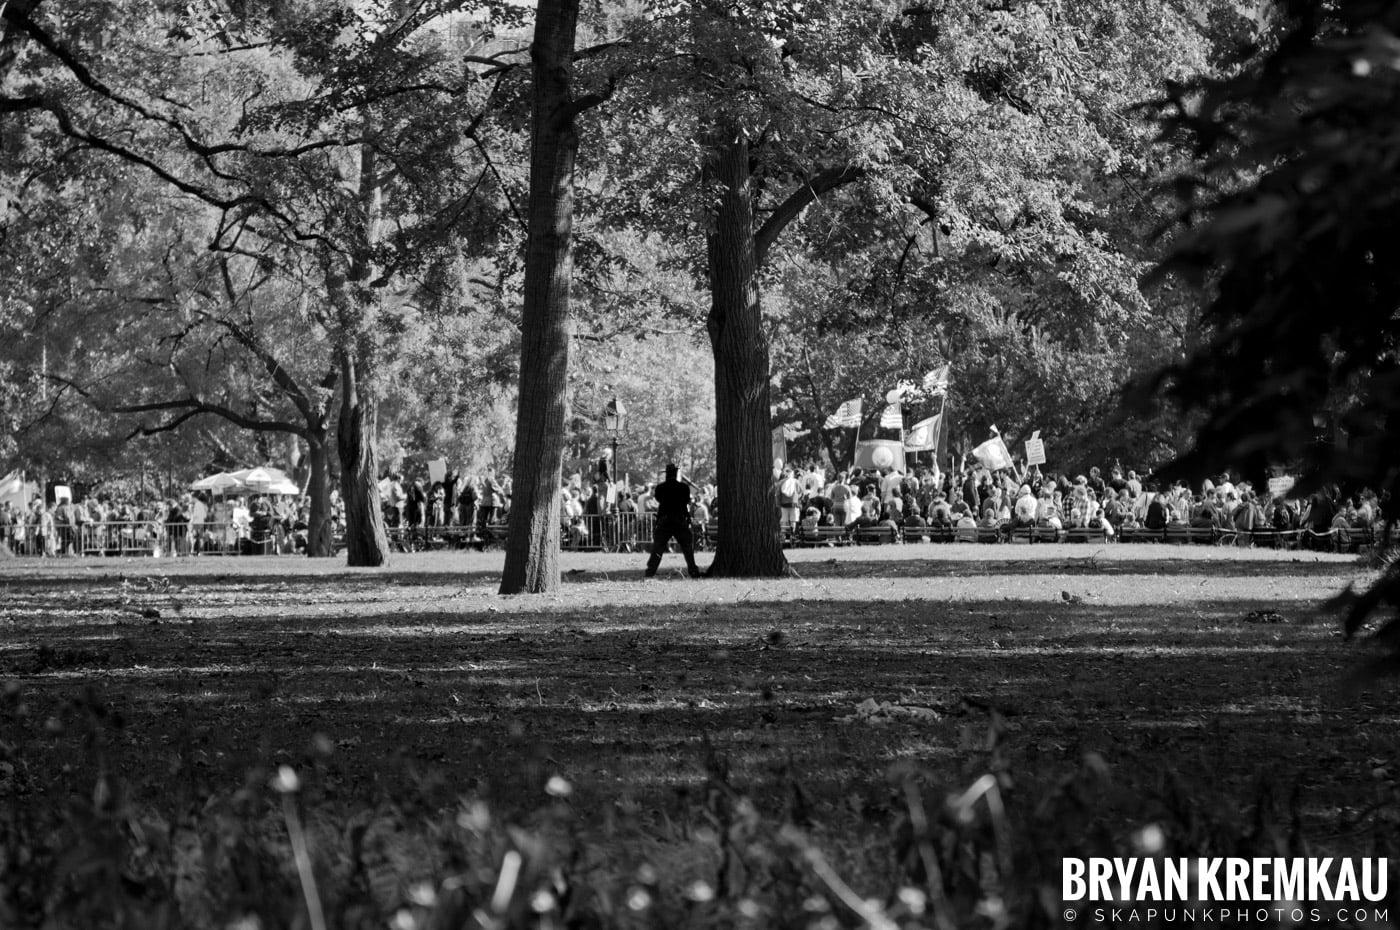 Occupy Wall Street @ Zuccotti Park and Washington Square Park, NYC - 10.15.11 (26)